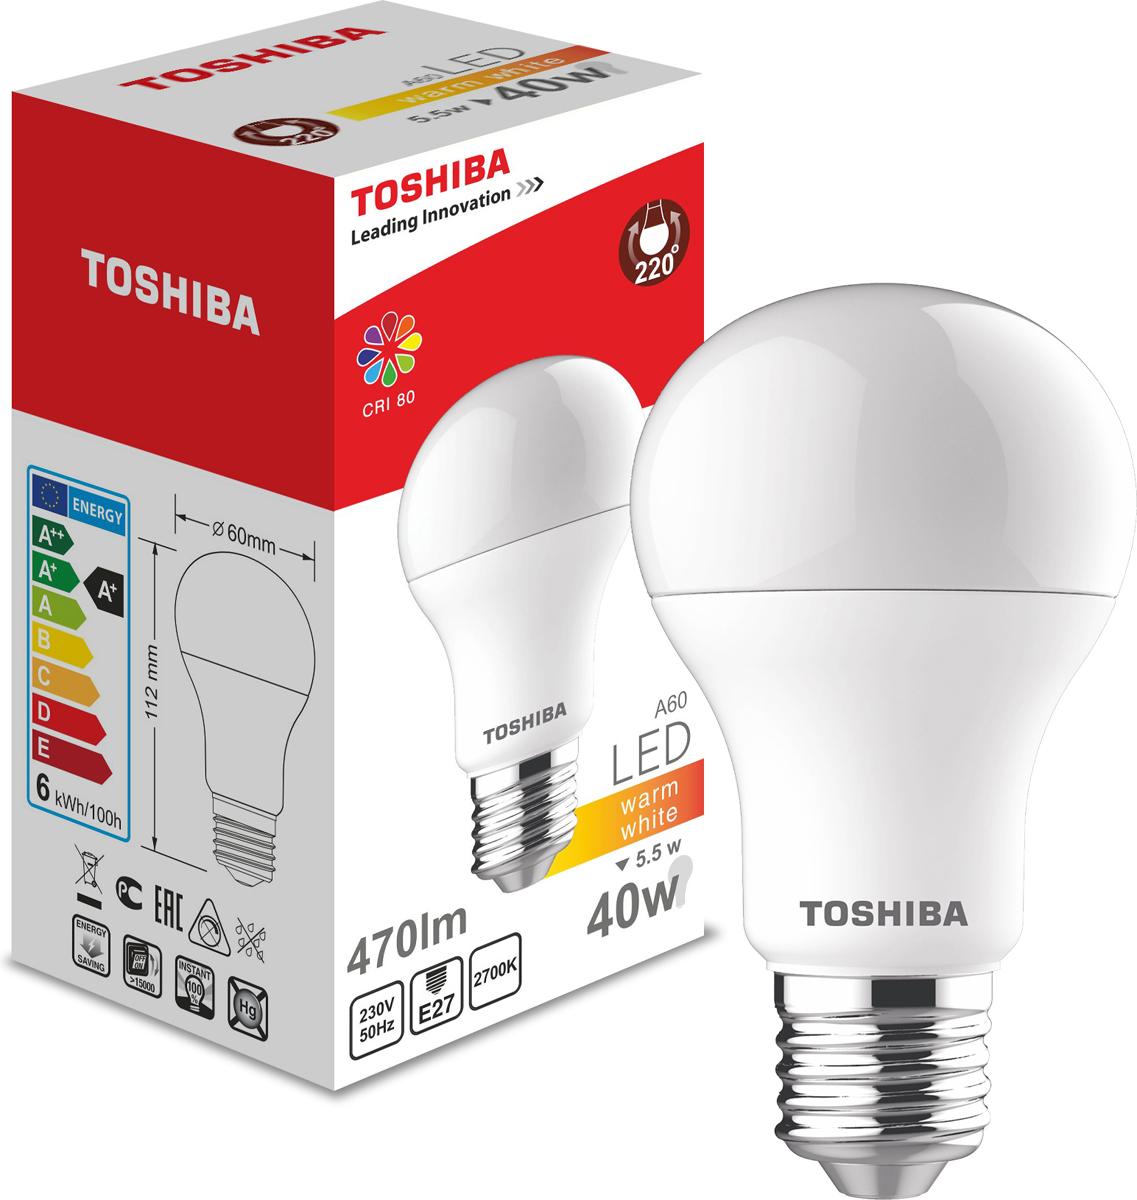 Лампа светодиодная Toshiba, теплый свет, цоколь E27, 5,5W, 2700K. 101315010B101315010BСветодиодная лампа Toshiba А60 5,5W 2700K, Е27, 470 Люмен, А+5 лет гарантии!